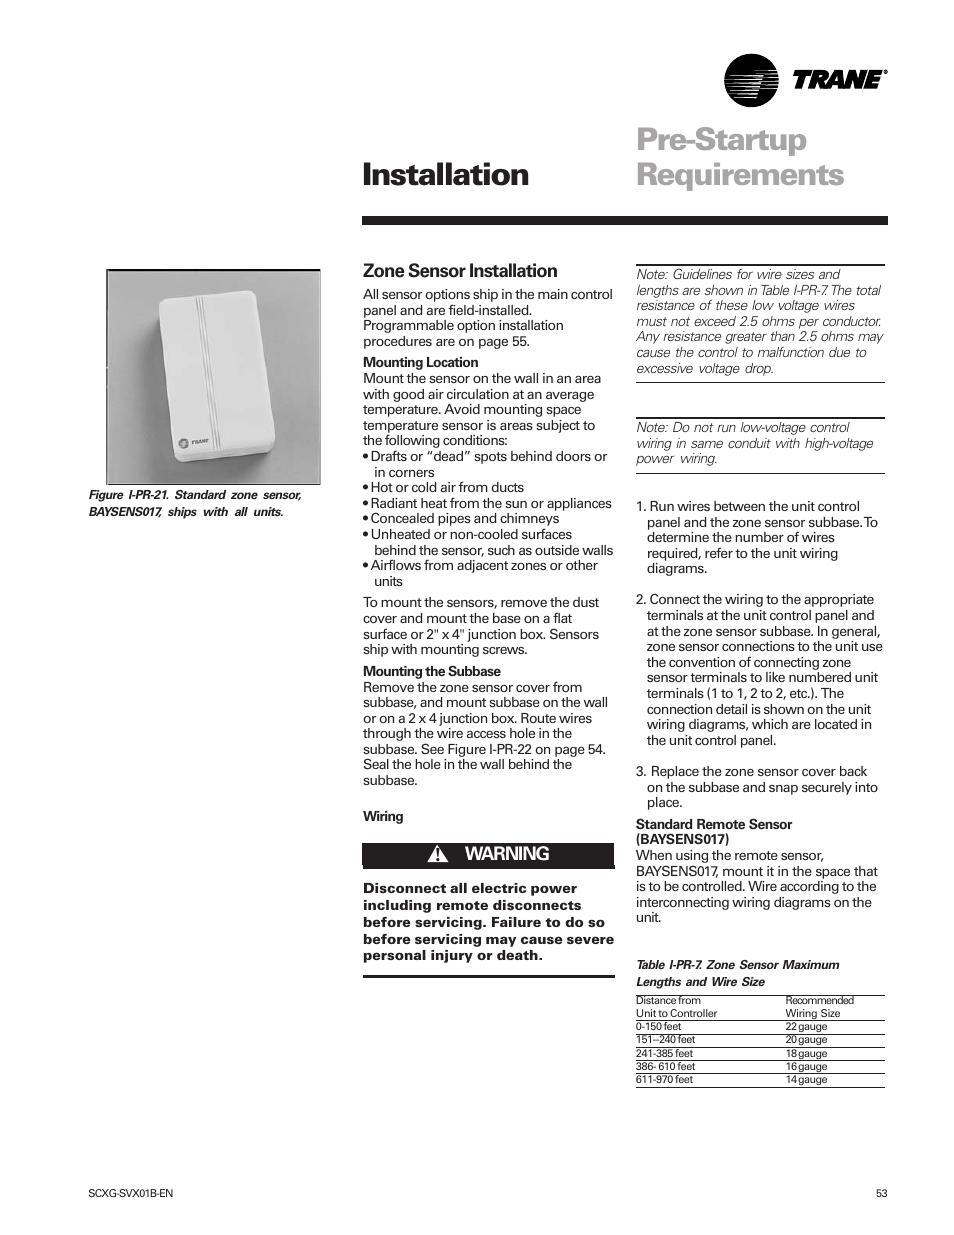 pre-startup requirements, installation, zone sensor installation | trane  intellipak scwg 020 user manual | page 53 / 124